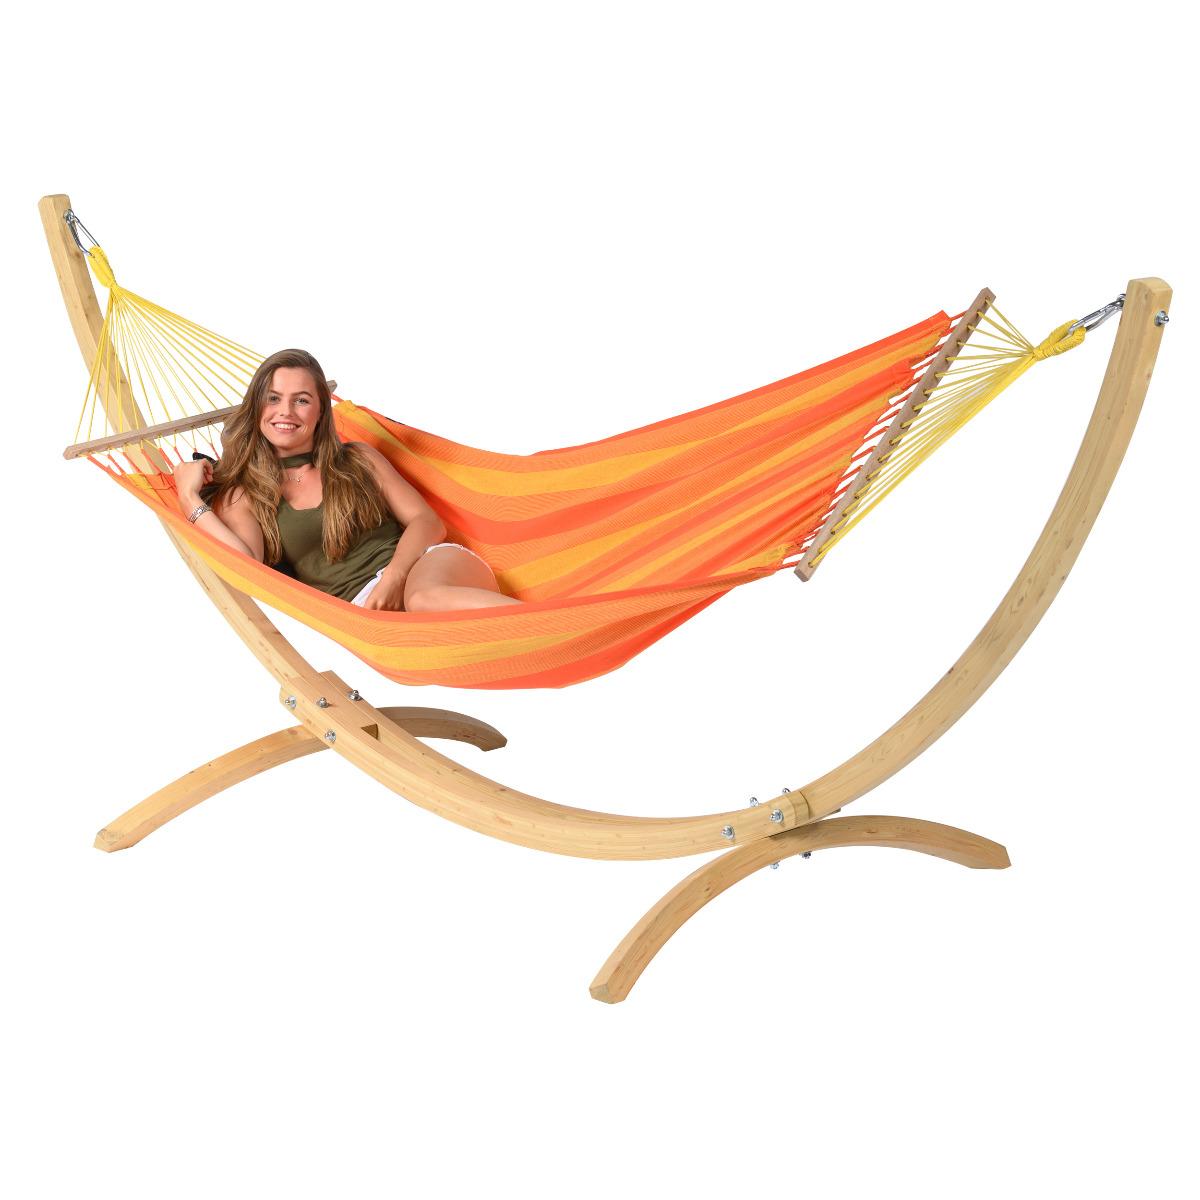 'Relax' Orange E�npersoons Hangmat - Oranje - Tropilex �